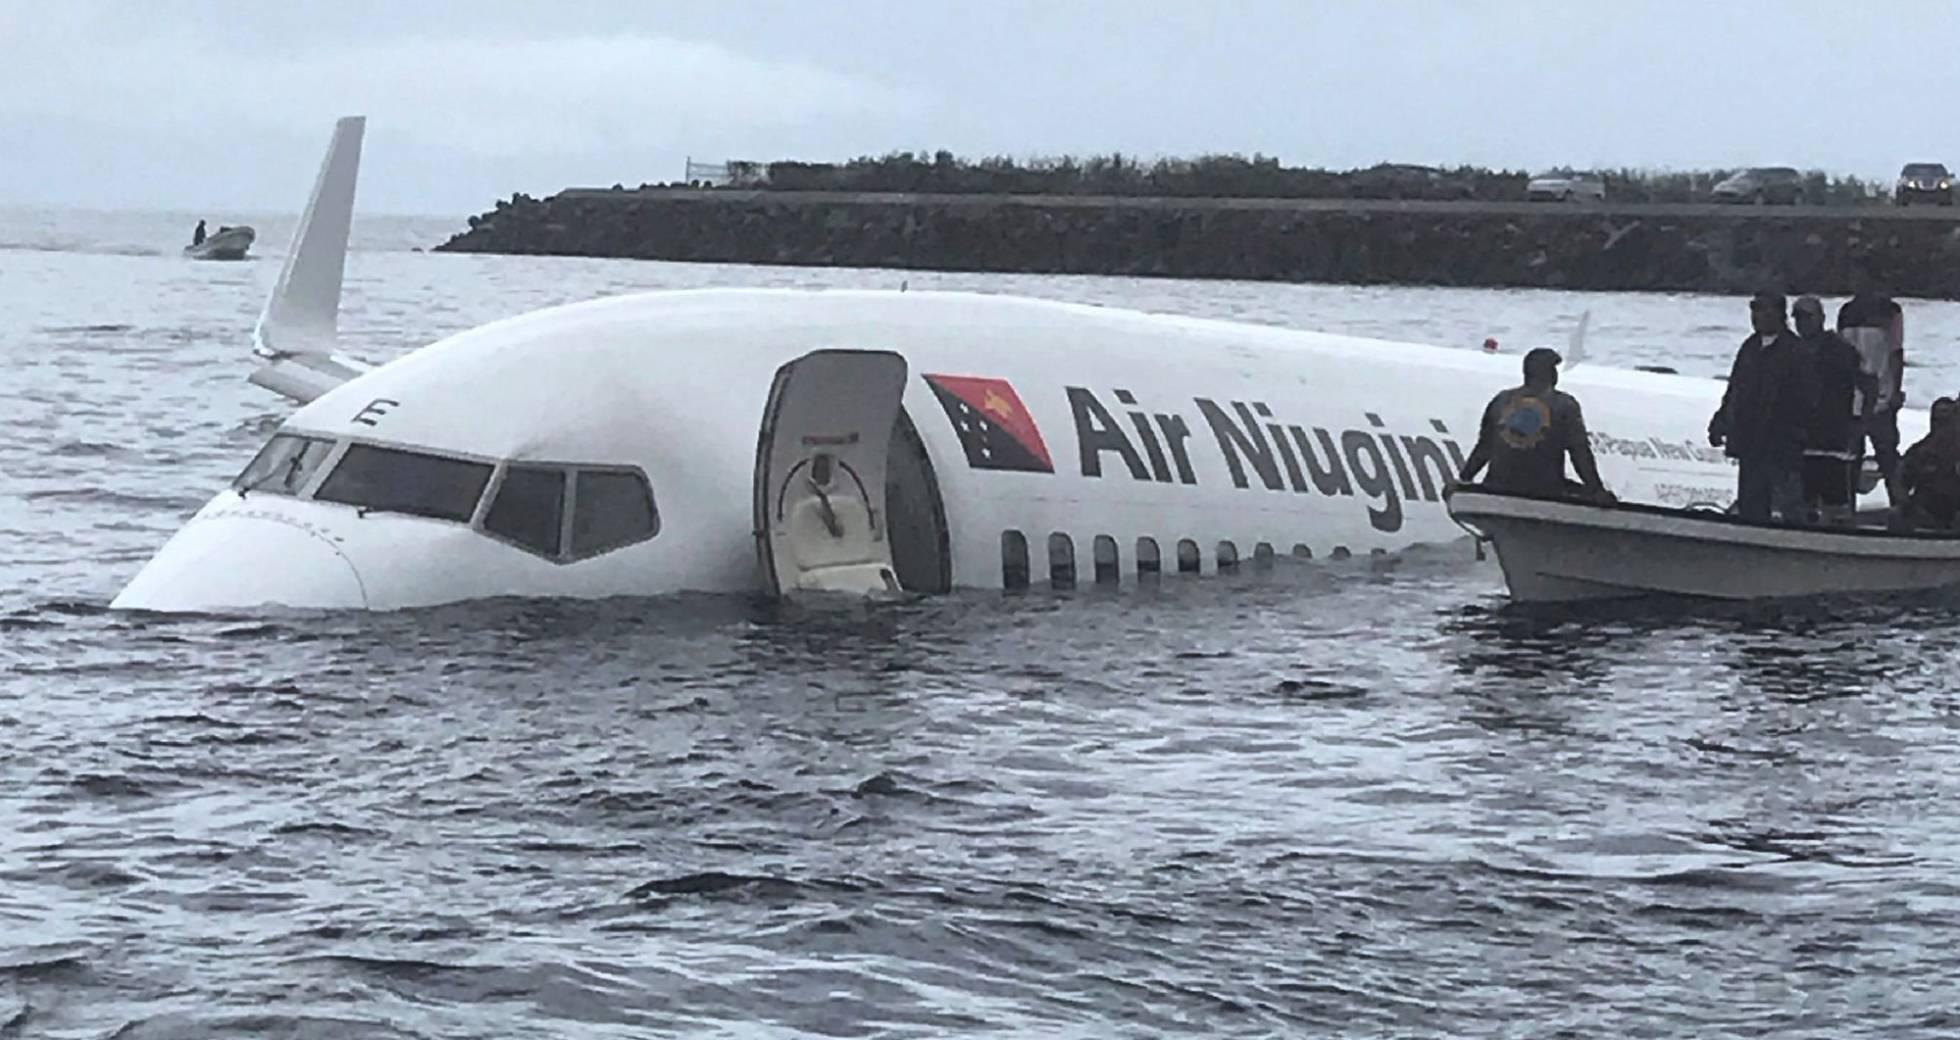 Accidente de un avión en Micronesia.